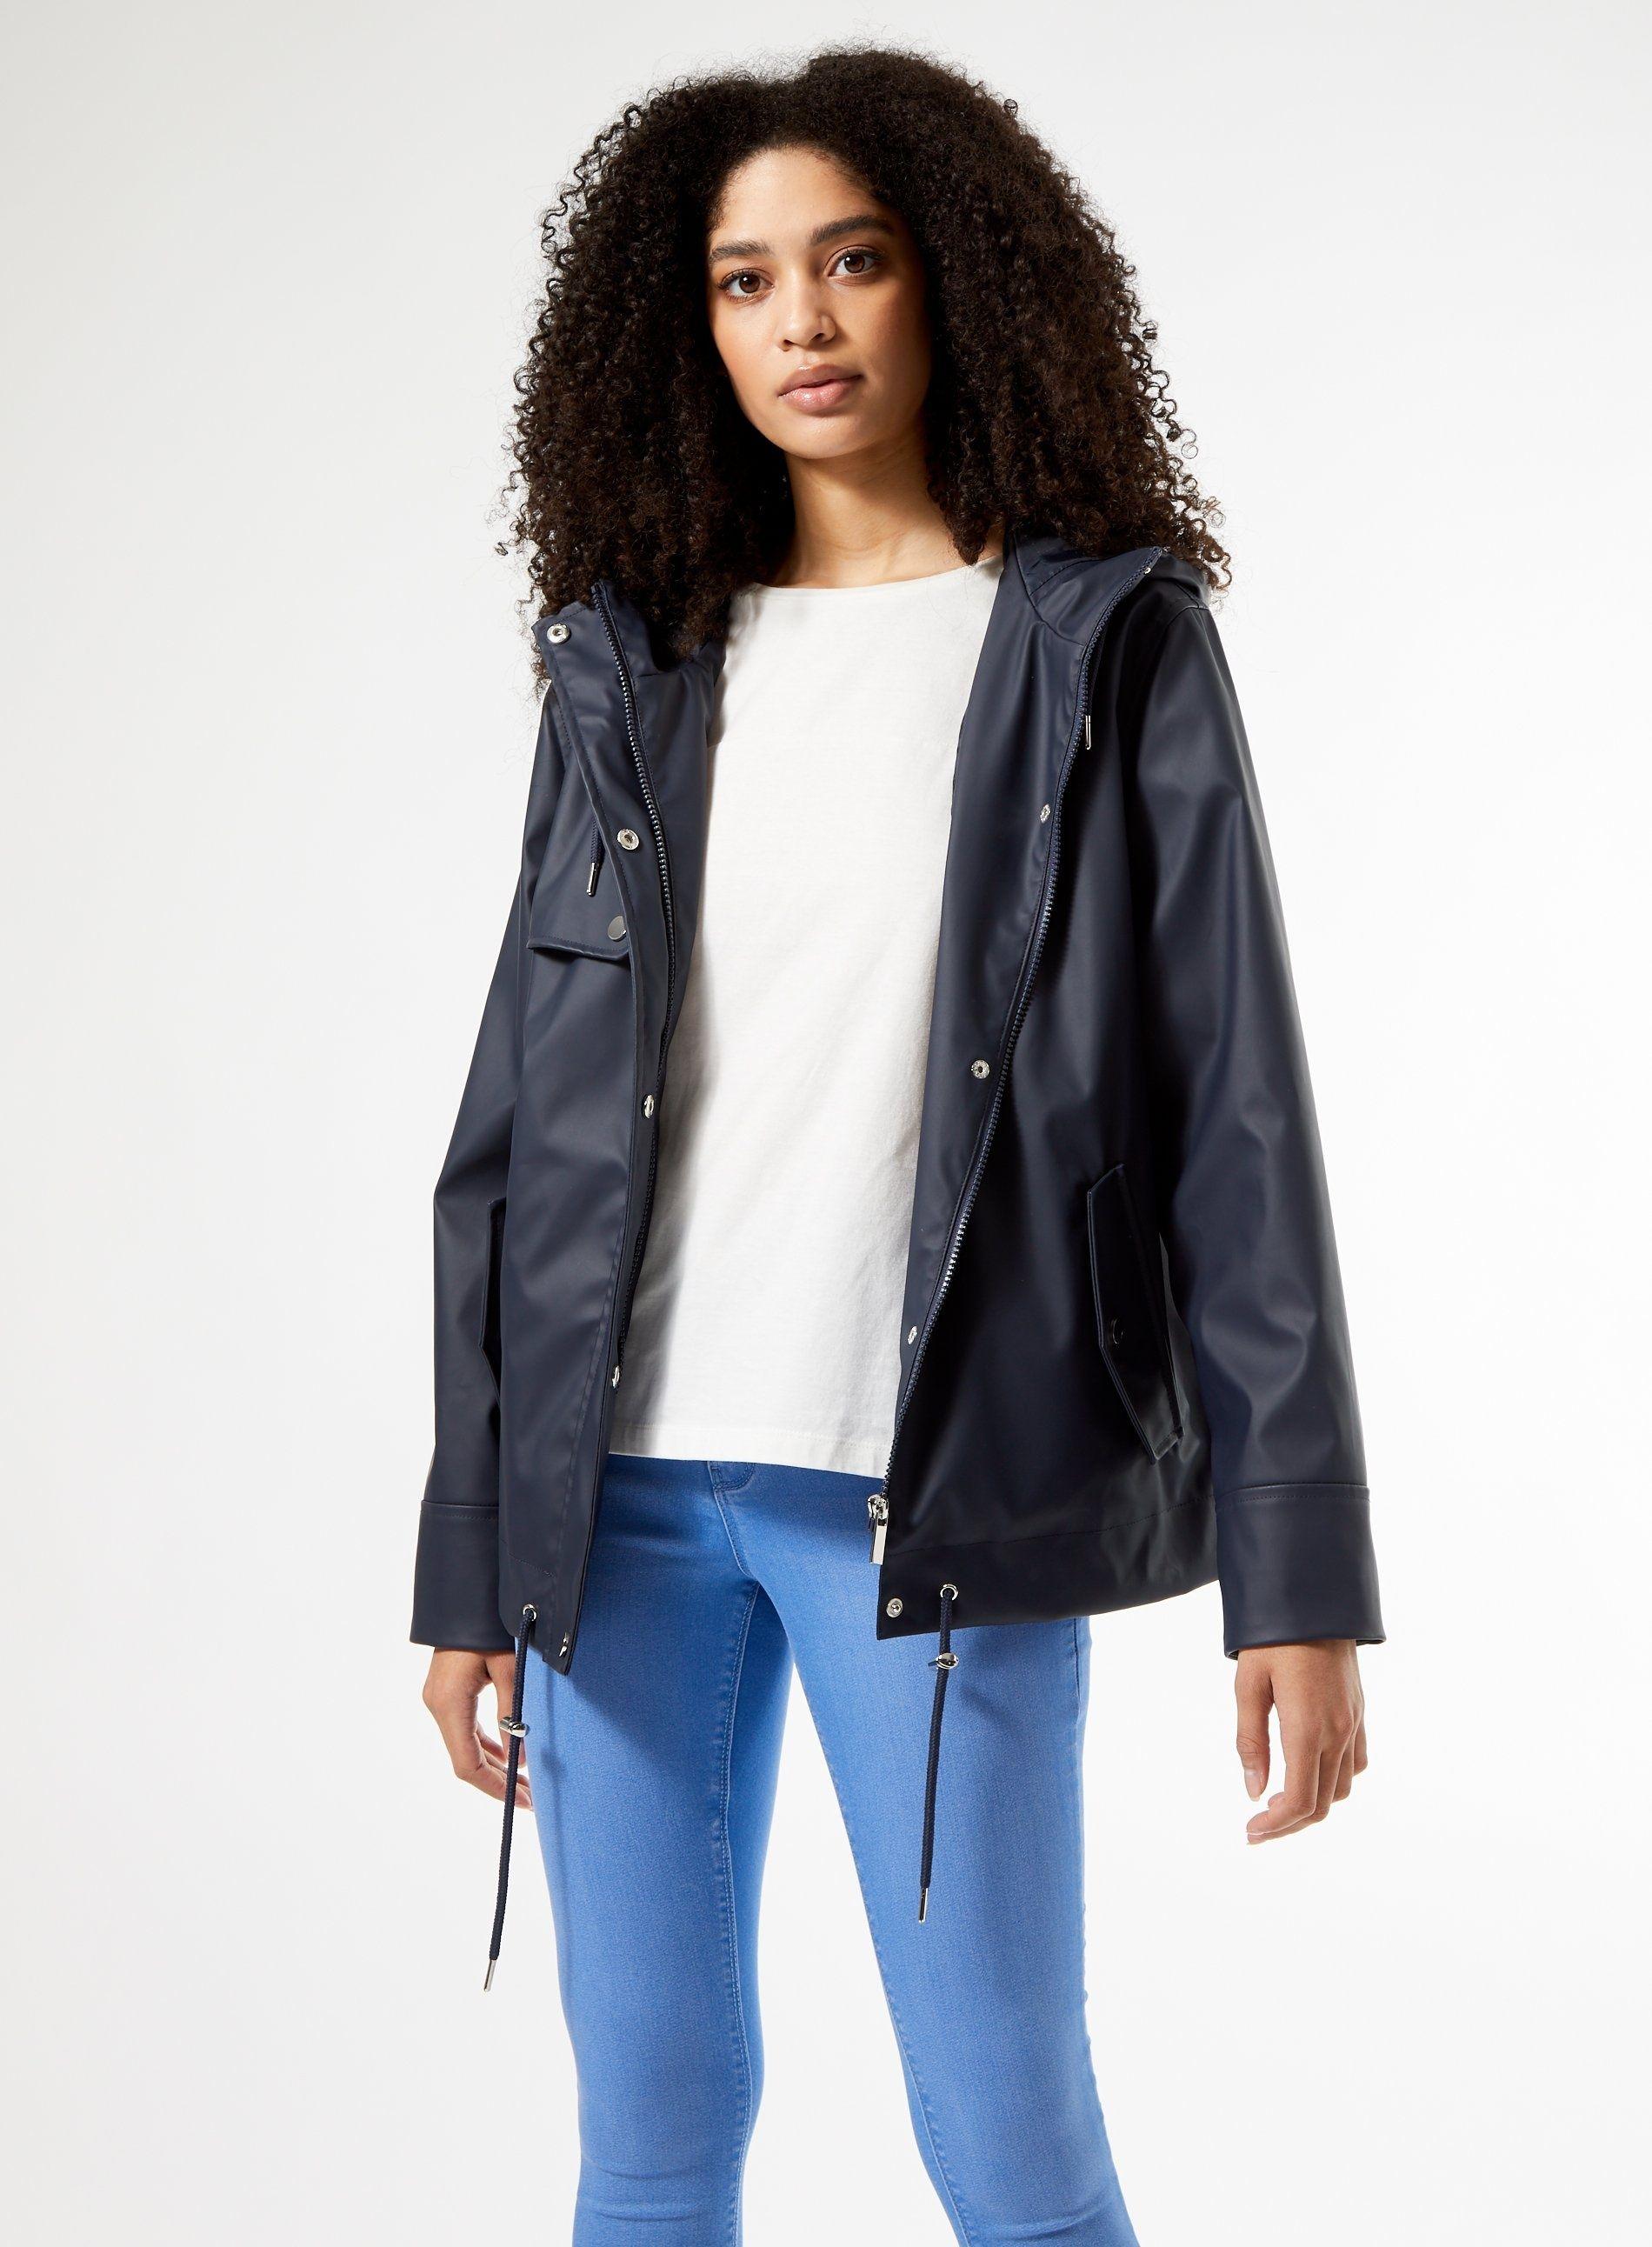 Dorothy Perkins Womens Blue Short Raincoat Long Sleeve Drawcord Top Outerwear